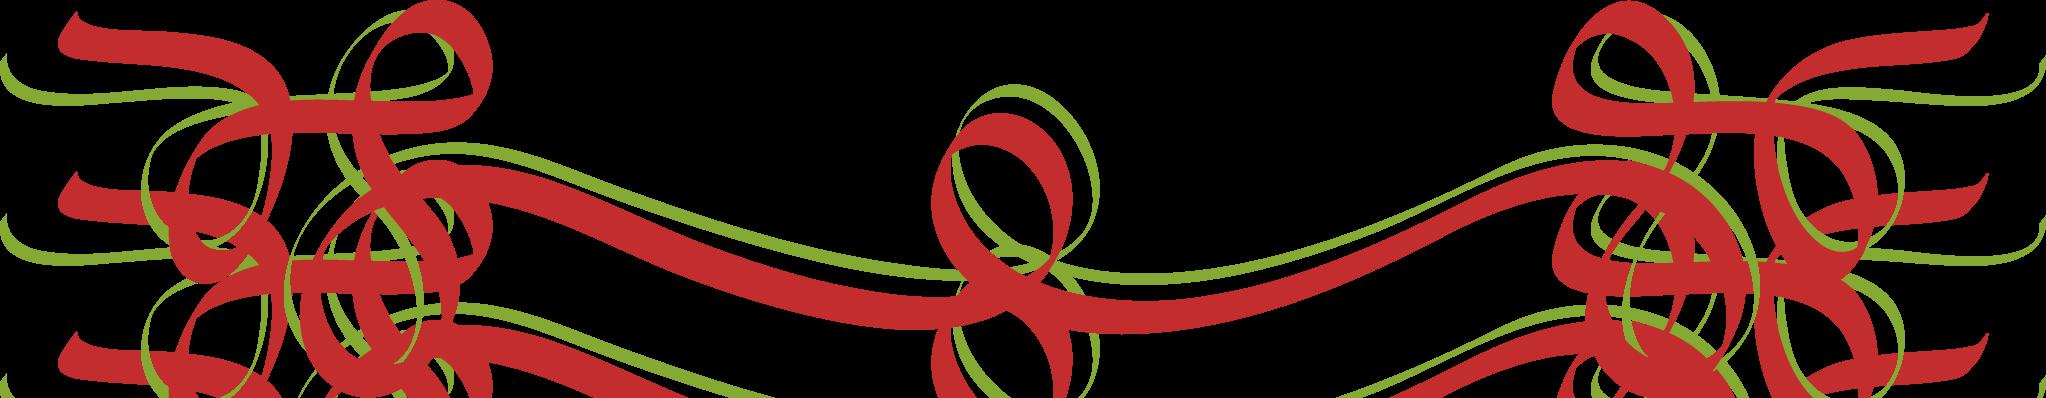 Alfa img - Showing > Reception Clip Art Employee Service